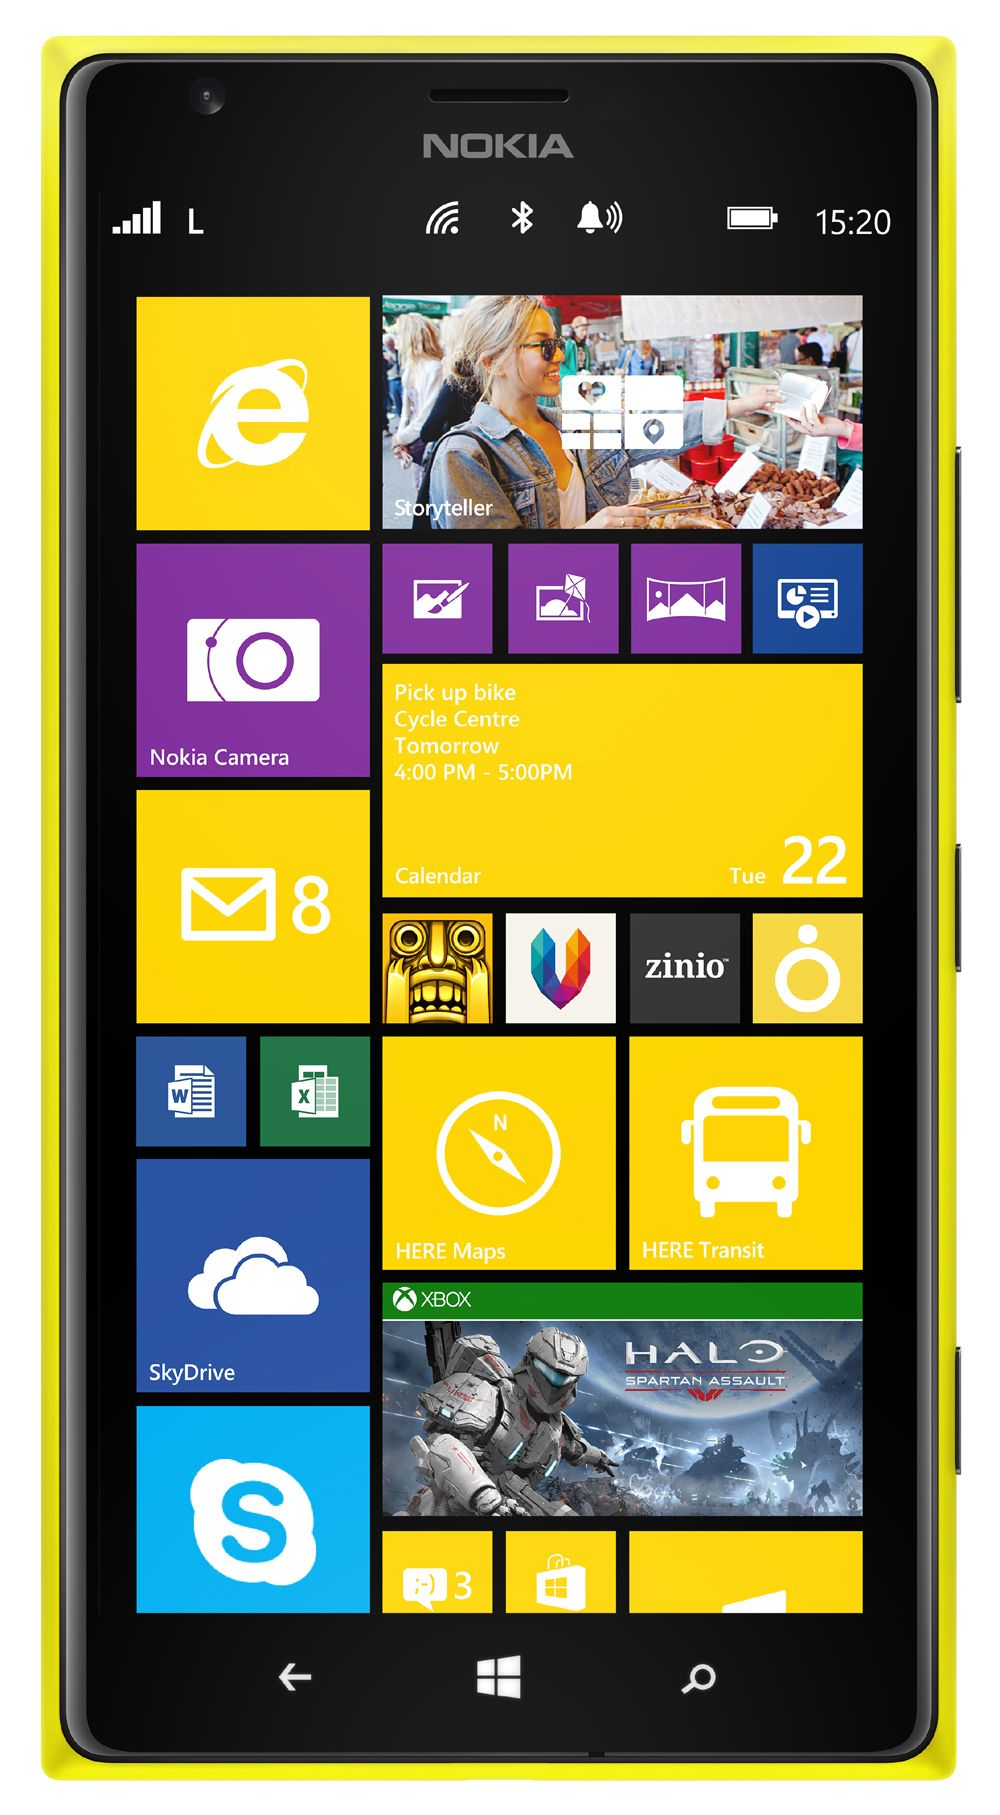 Nokia Lumia 1525 Vs 1520